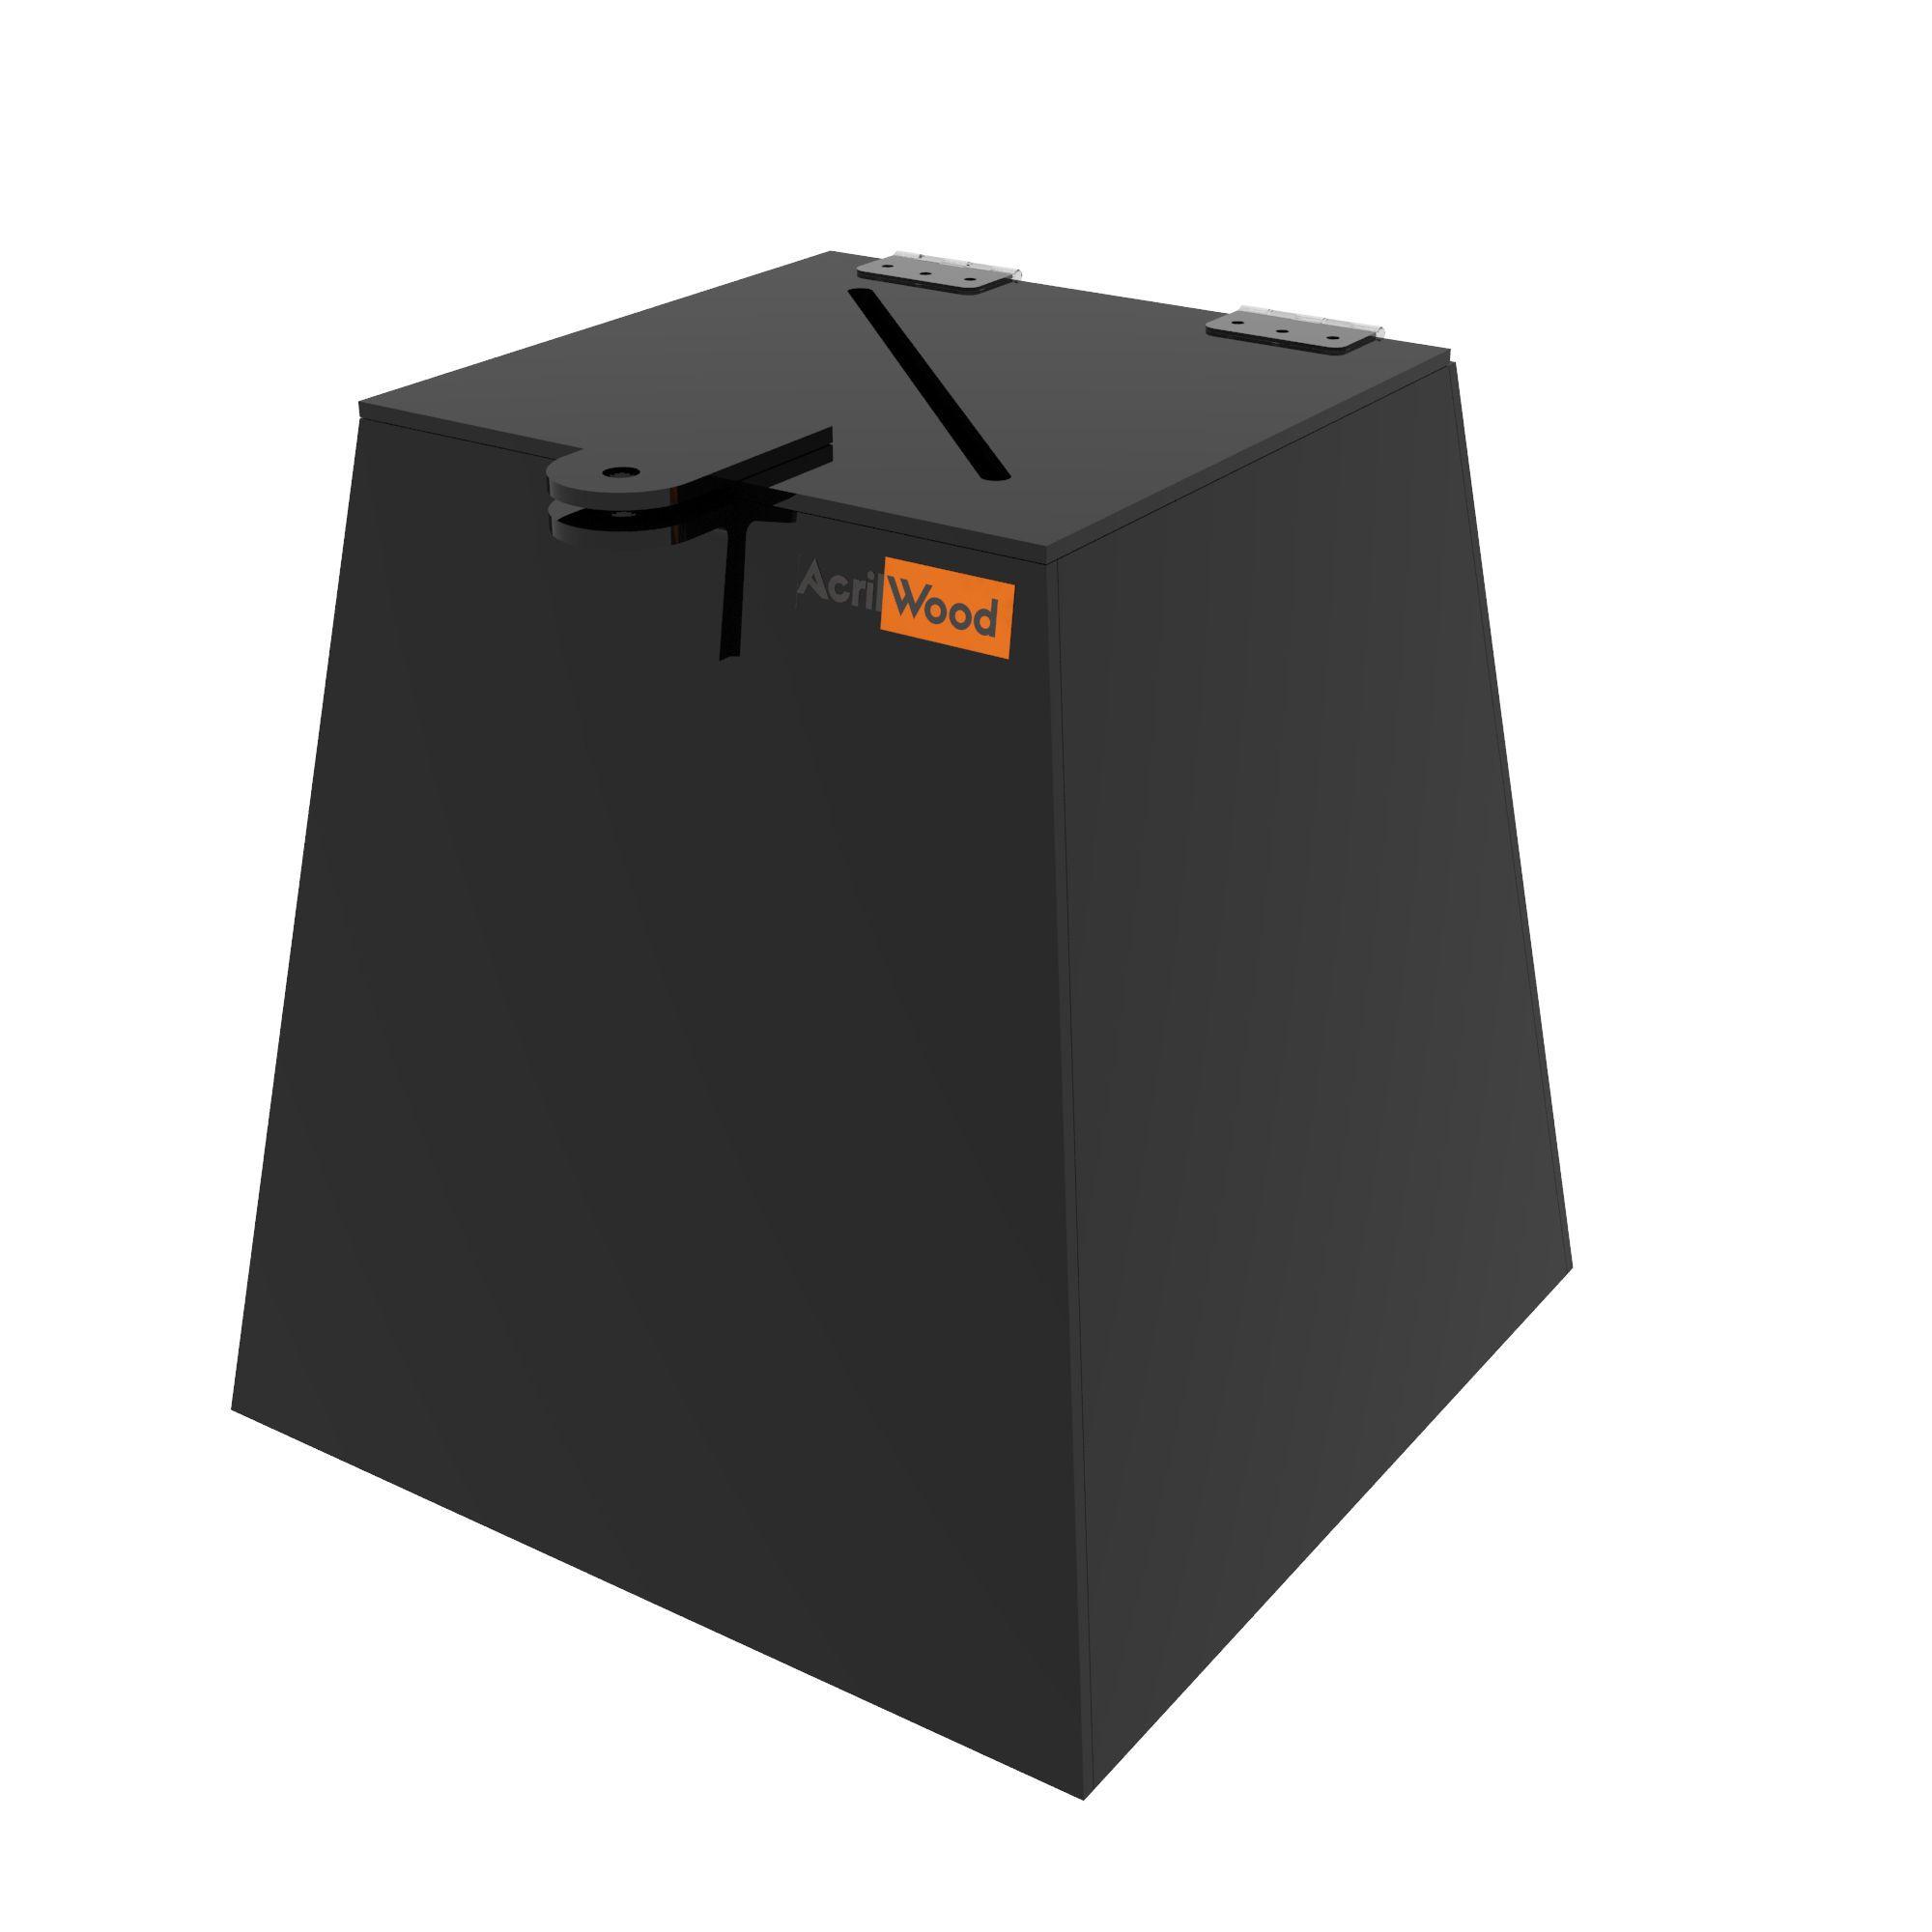 Urna Pirâmide Em Acrílico Preto - 20x20x20cm